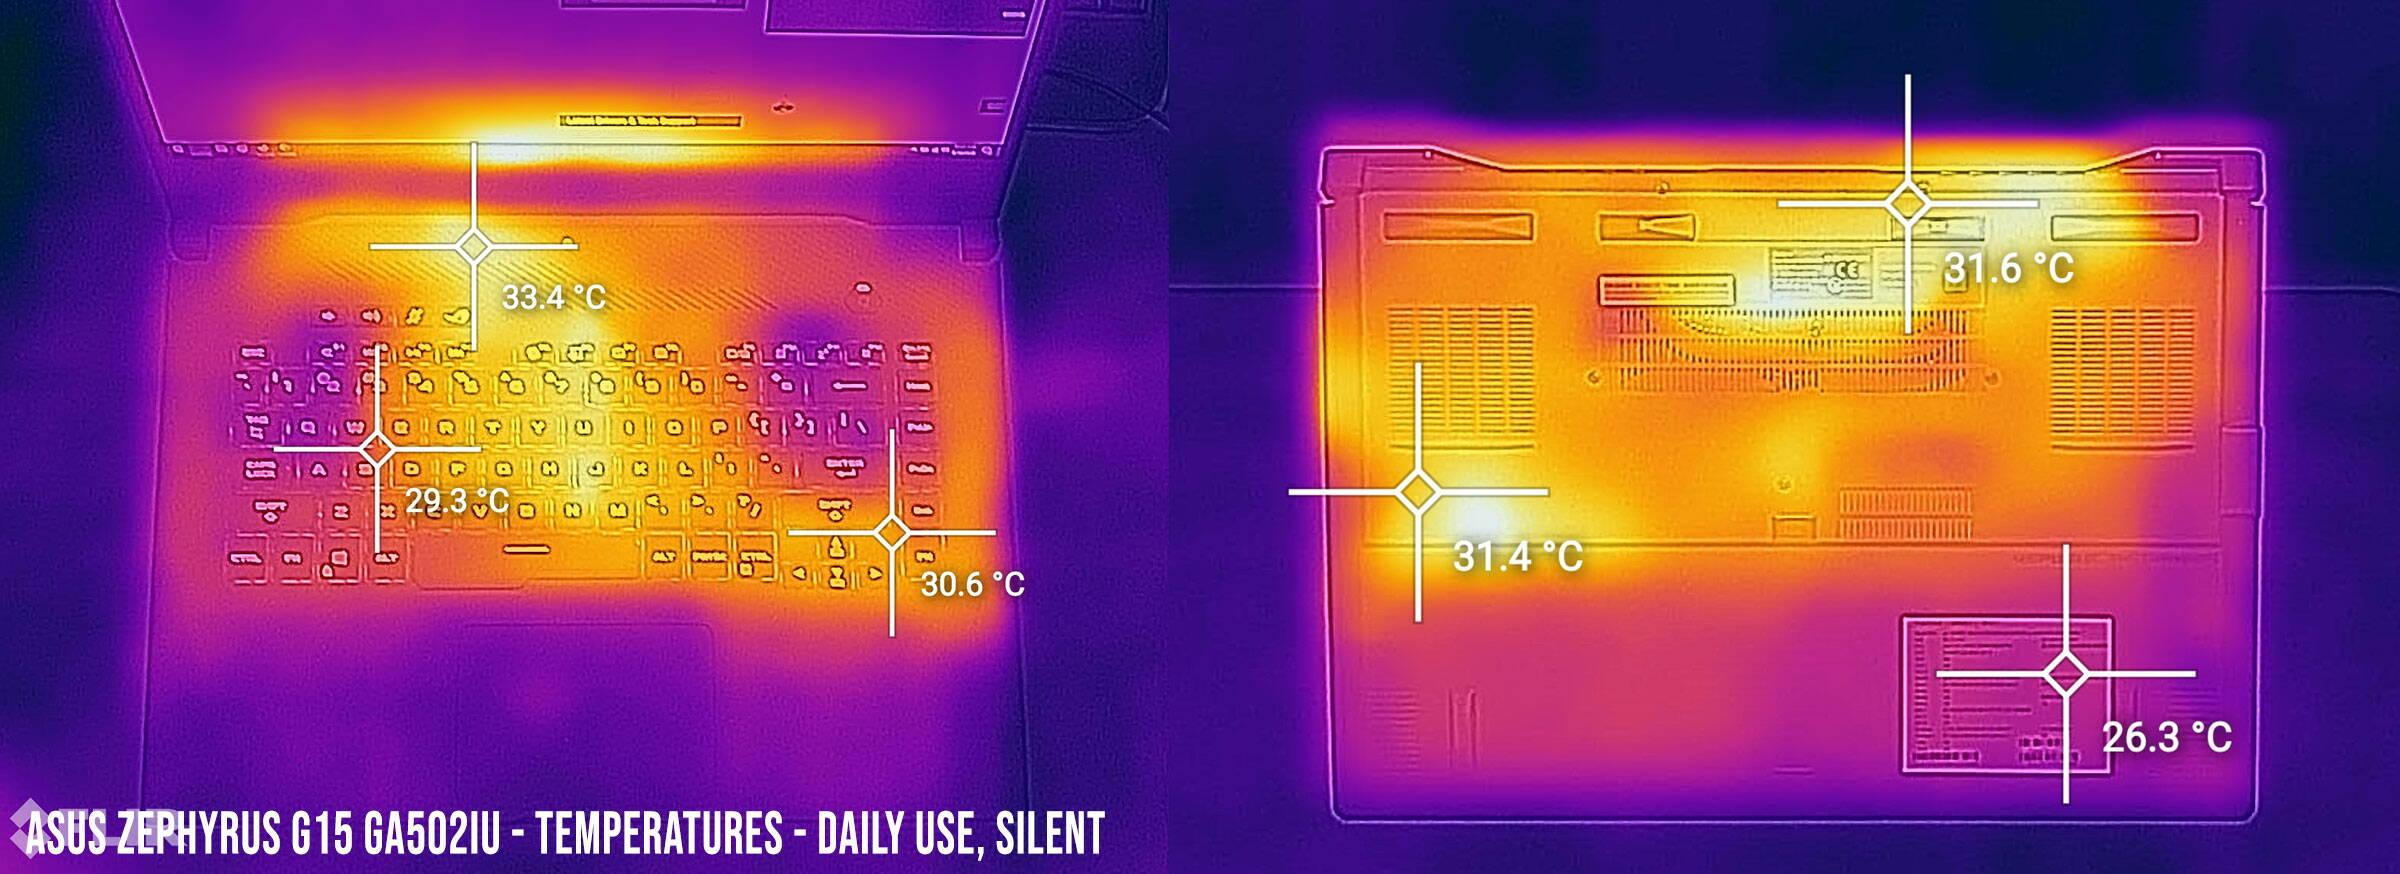 temperatures-zephyrusg15-dailyuse